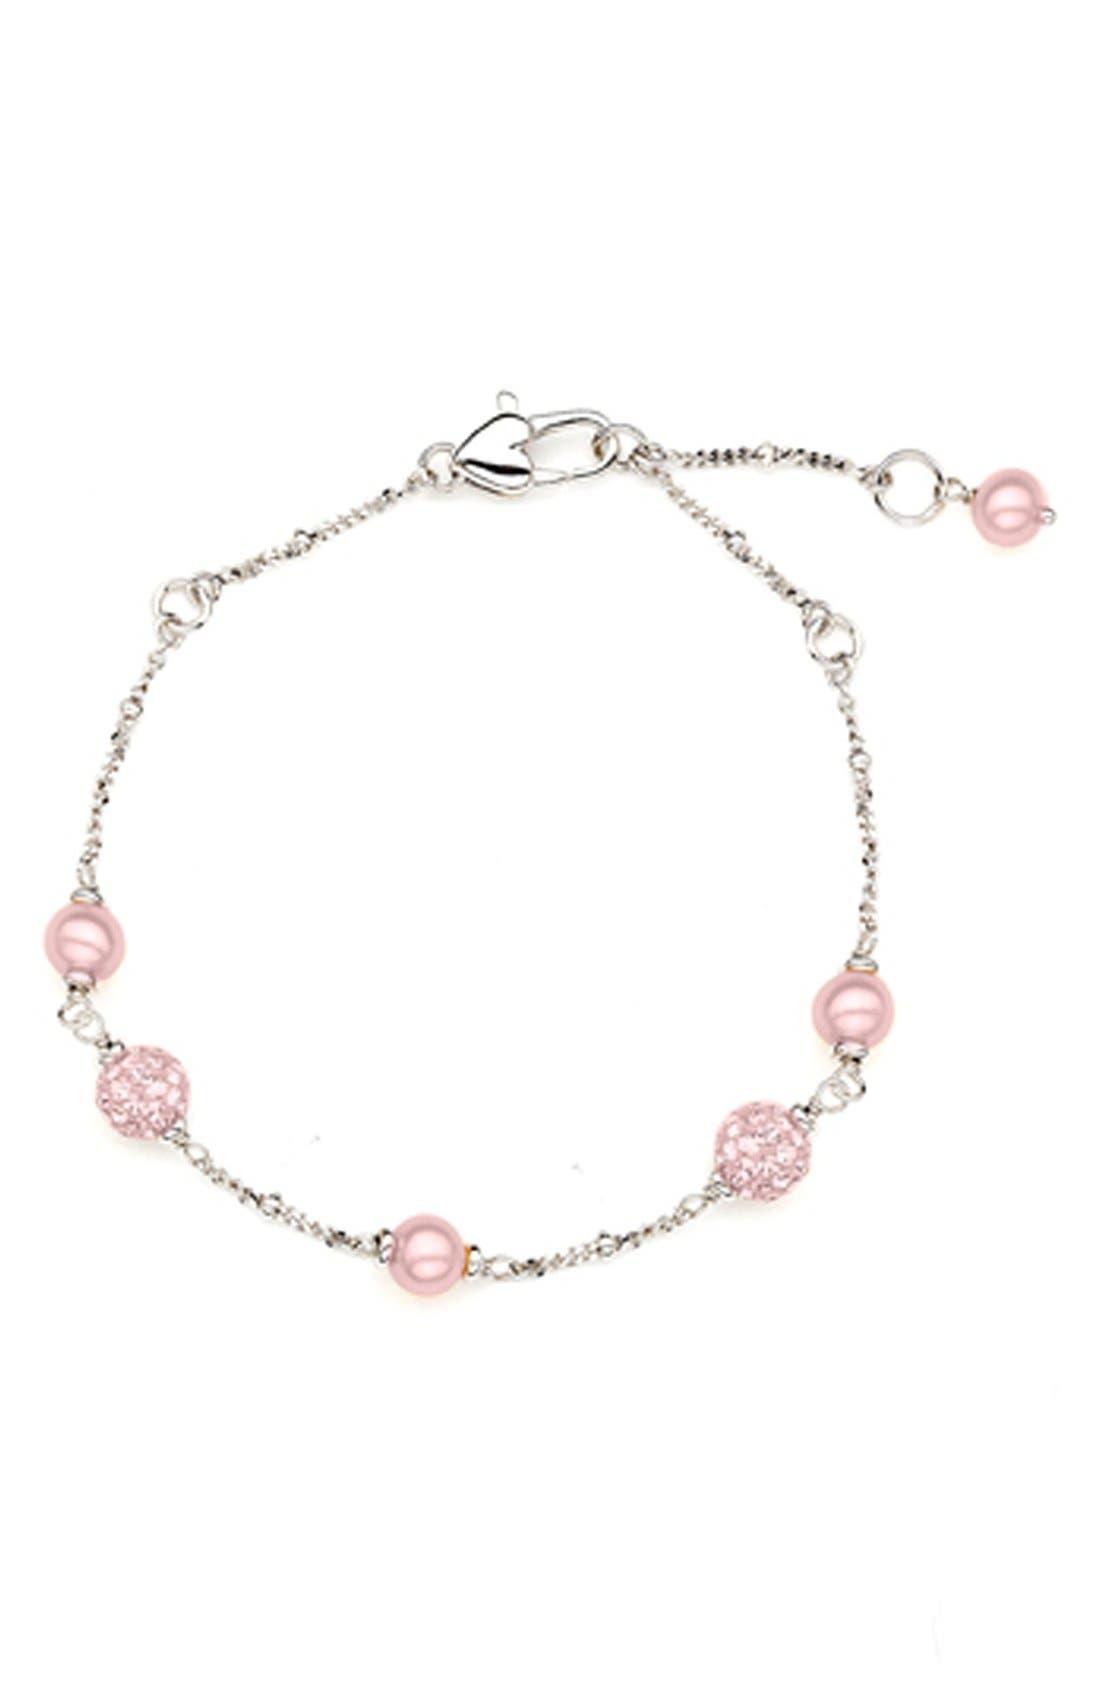 Crystal & Freshwater Pearl Station Bracelet,                             Main thumbnail 1, color,                             650